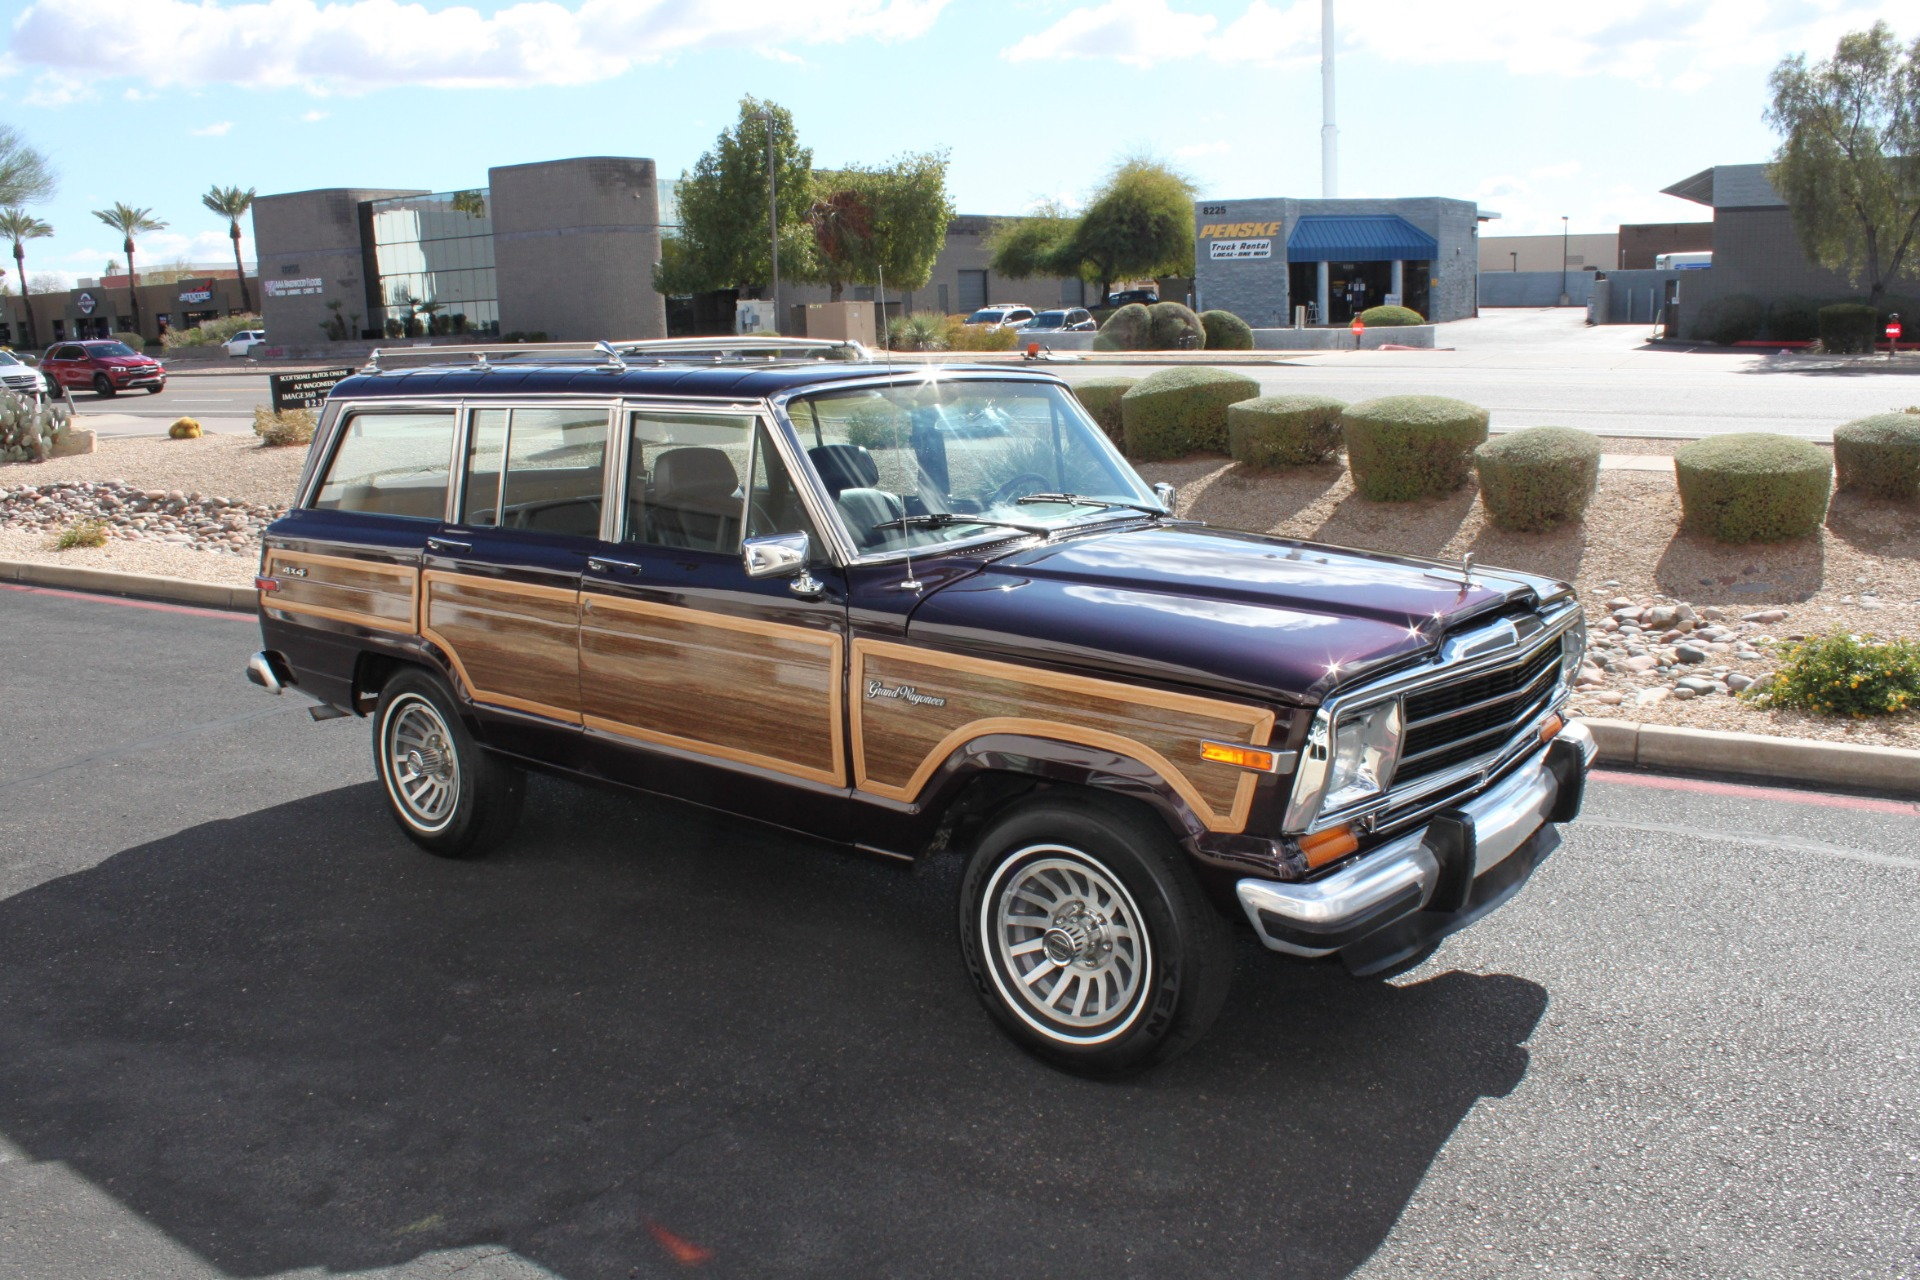 Used-1989-Jeep-Grand-Wagoneer-Chevrolet